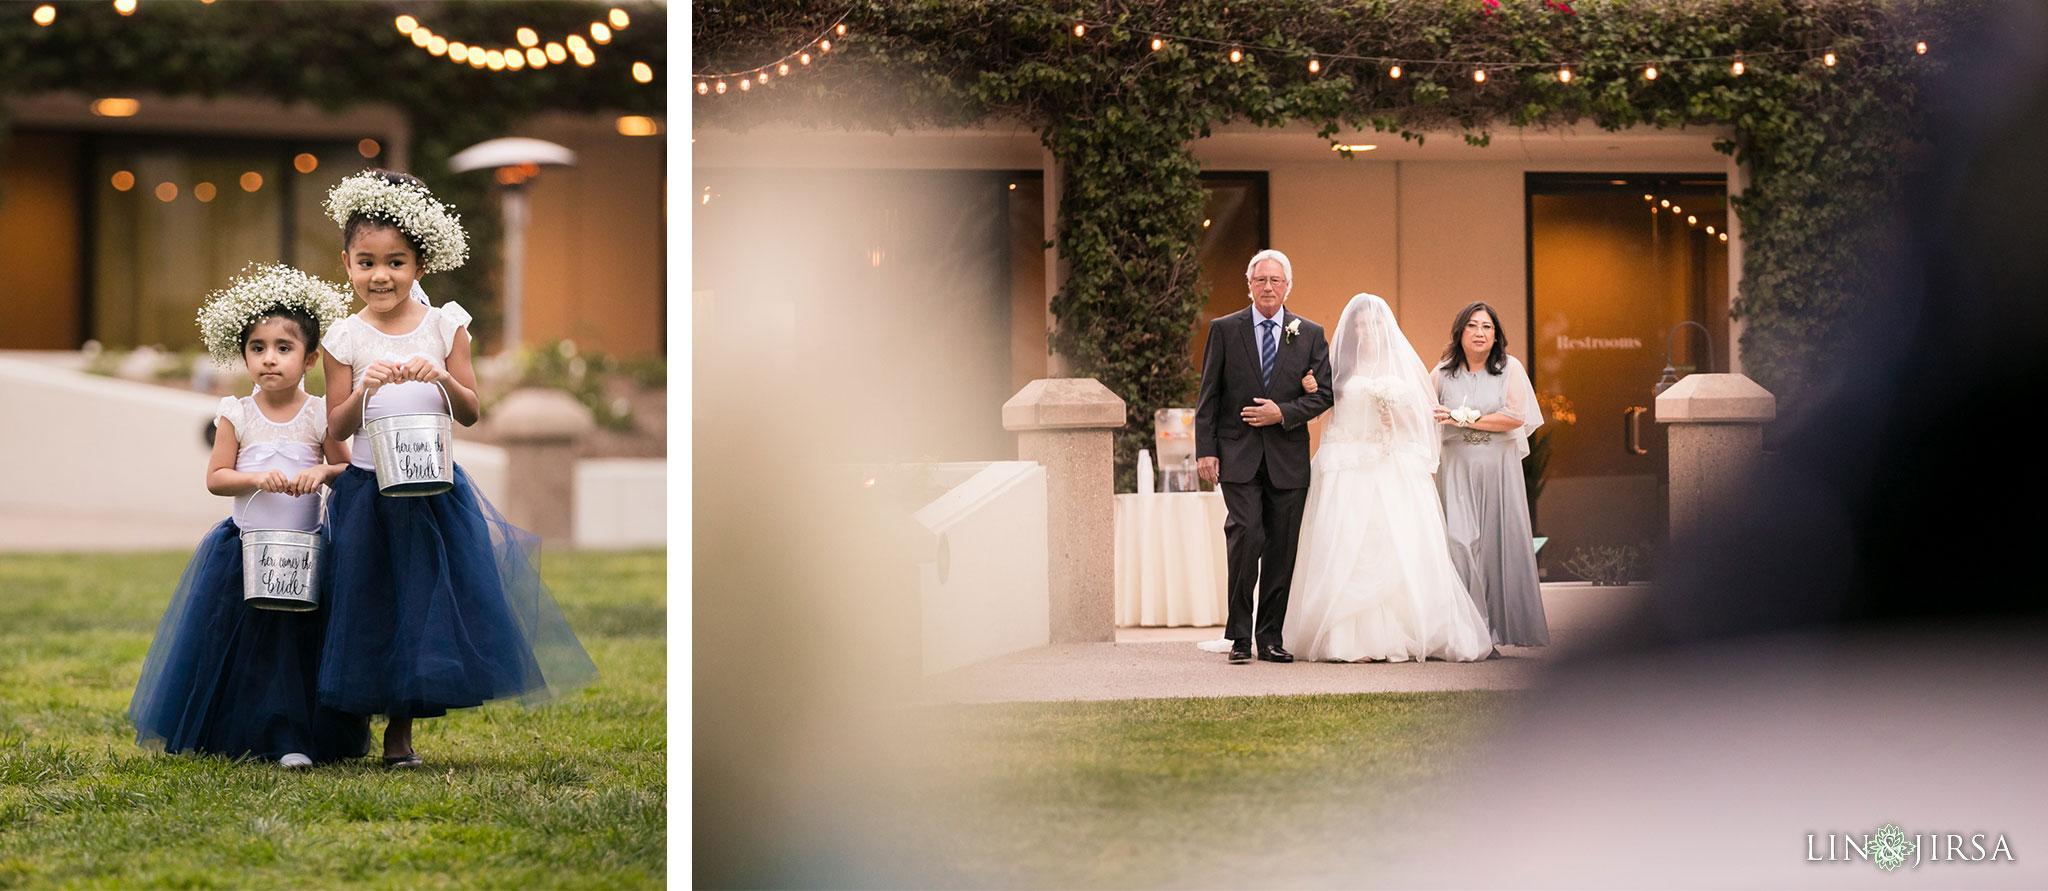 20 turnip rose promenade orange county wedding ceremony photography